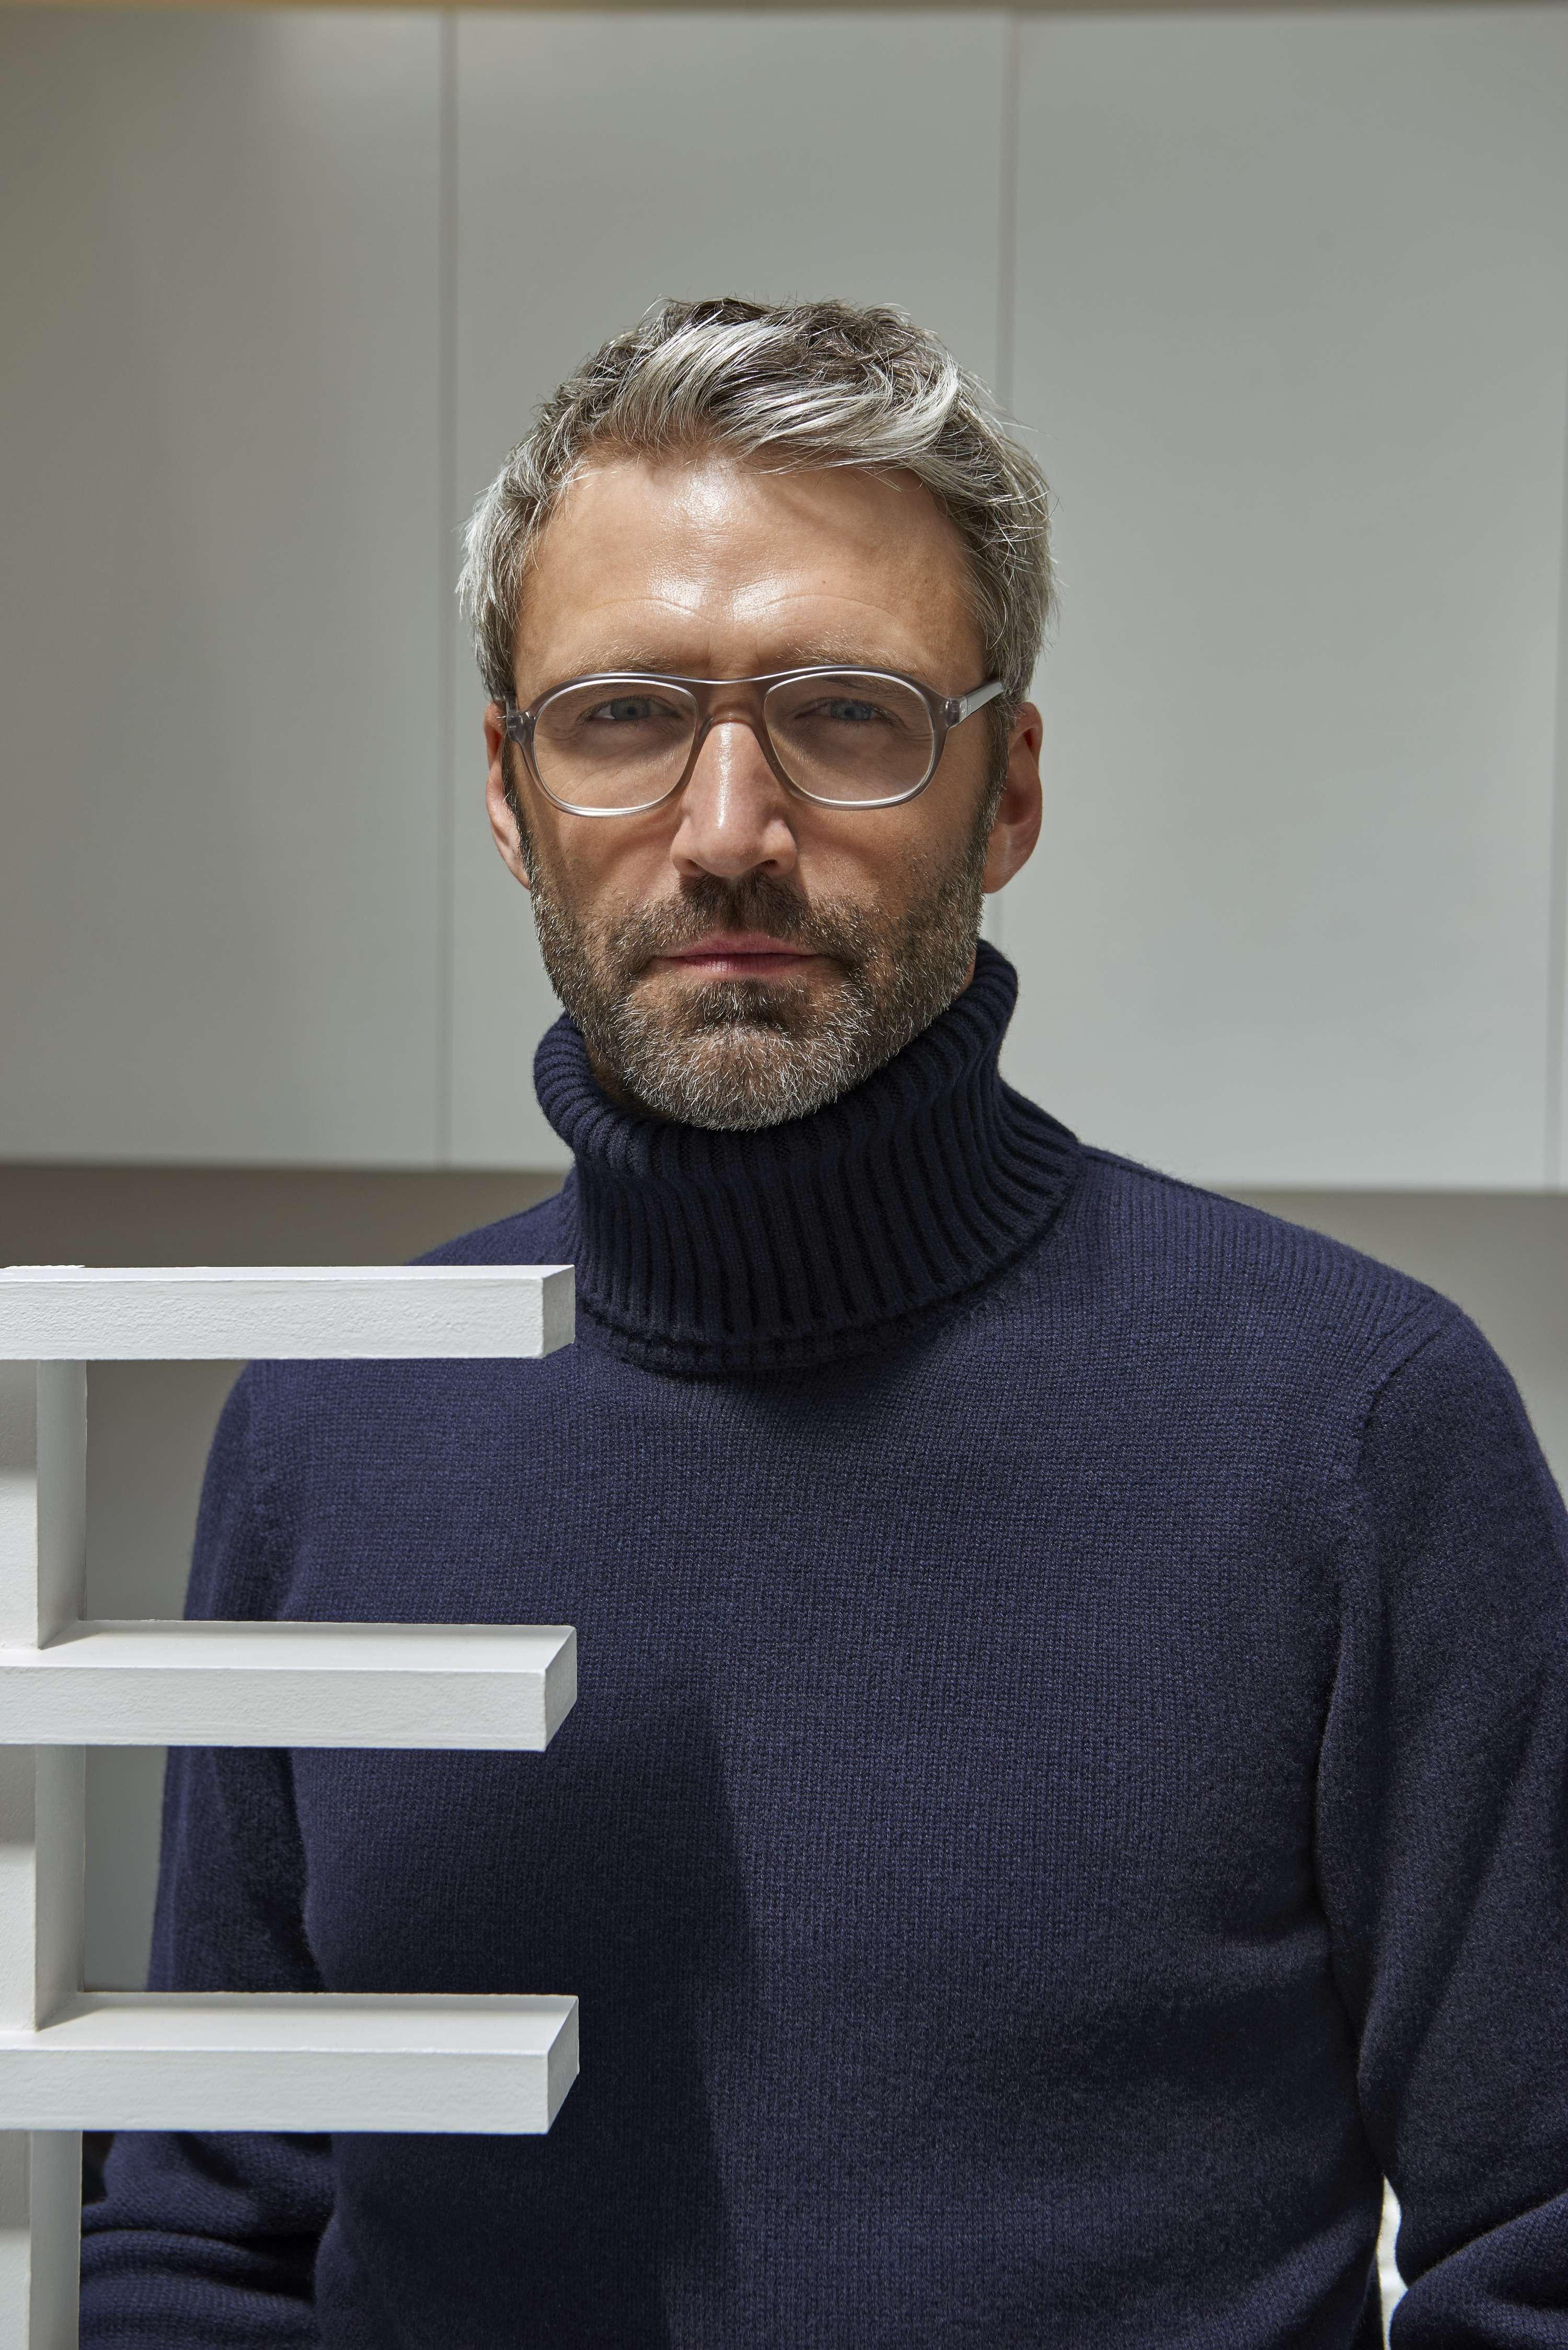 Interior Designer Mr Noé Duchaufour-Lawrance | The Dots